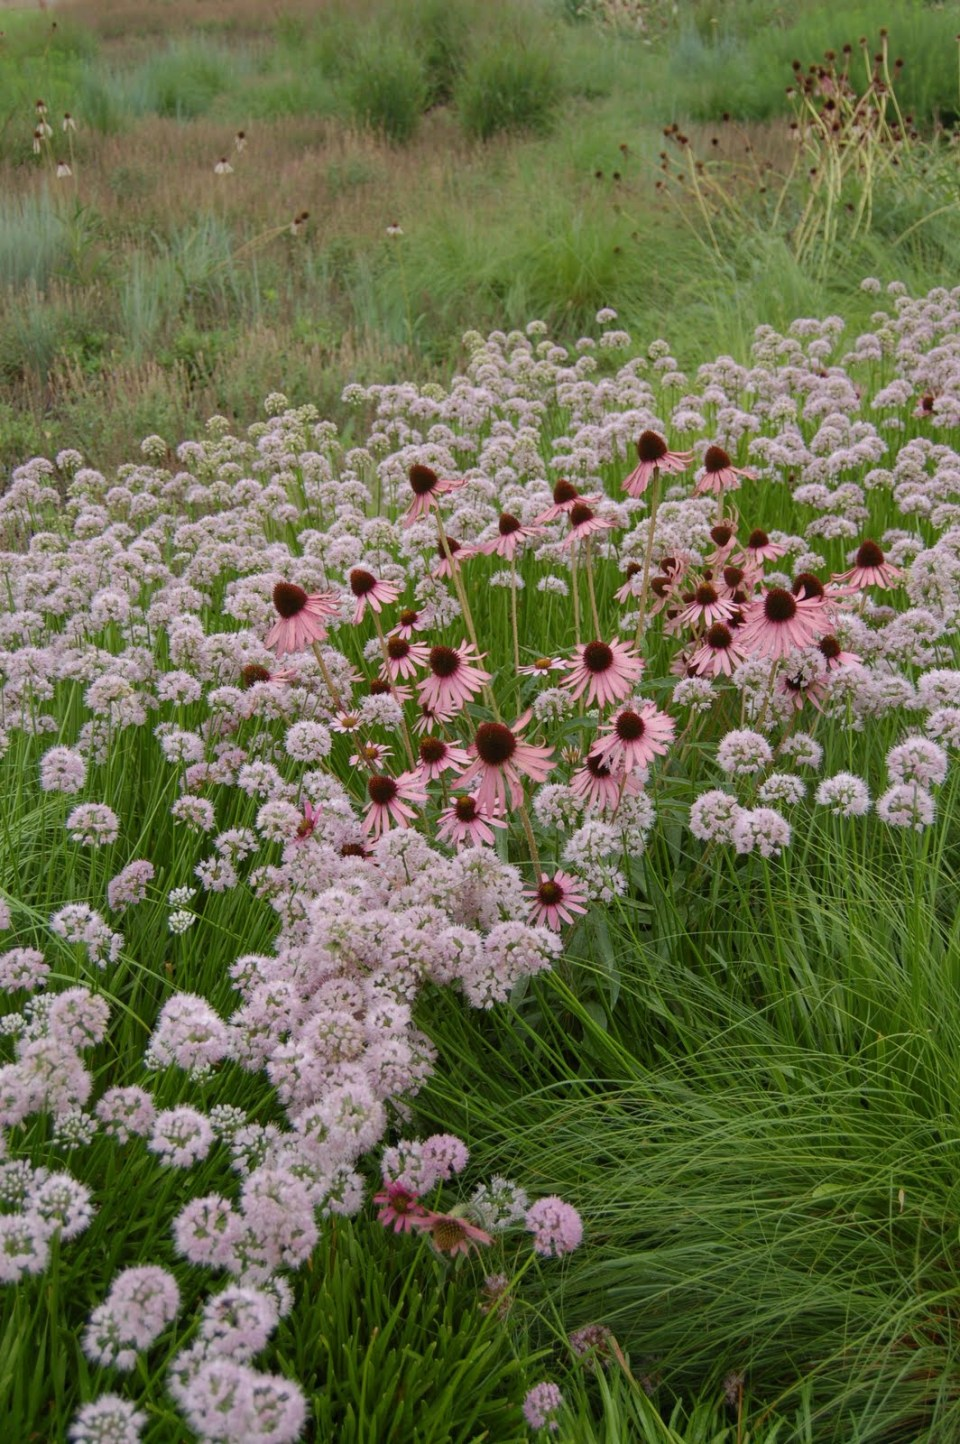 Perennials for your Cutting Garden - Echinacea